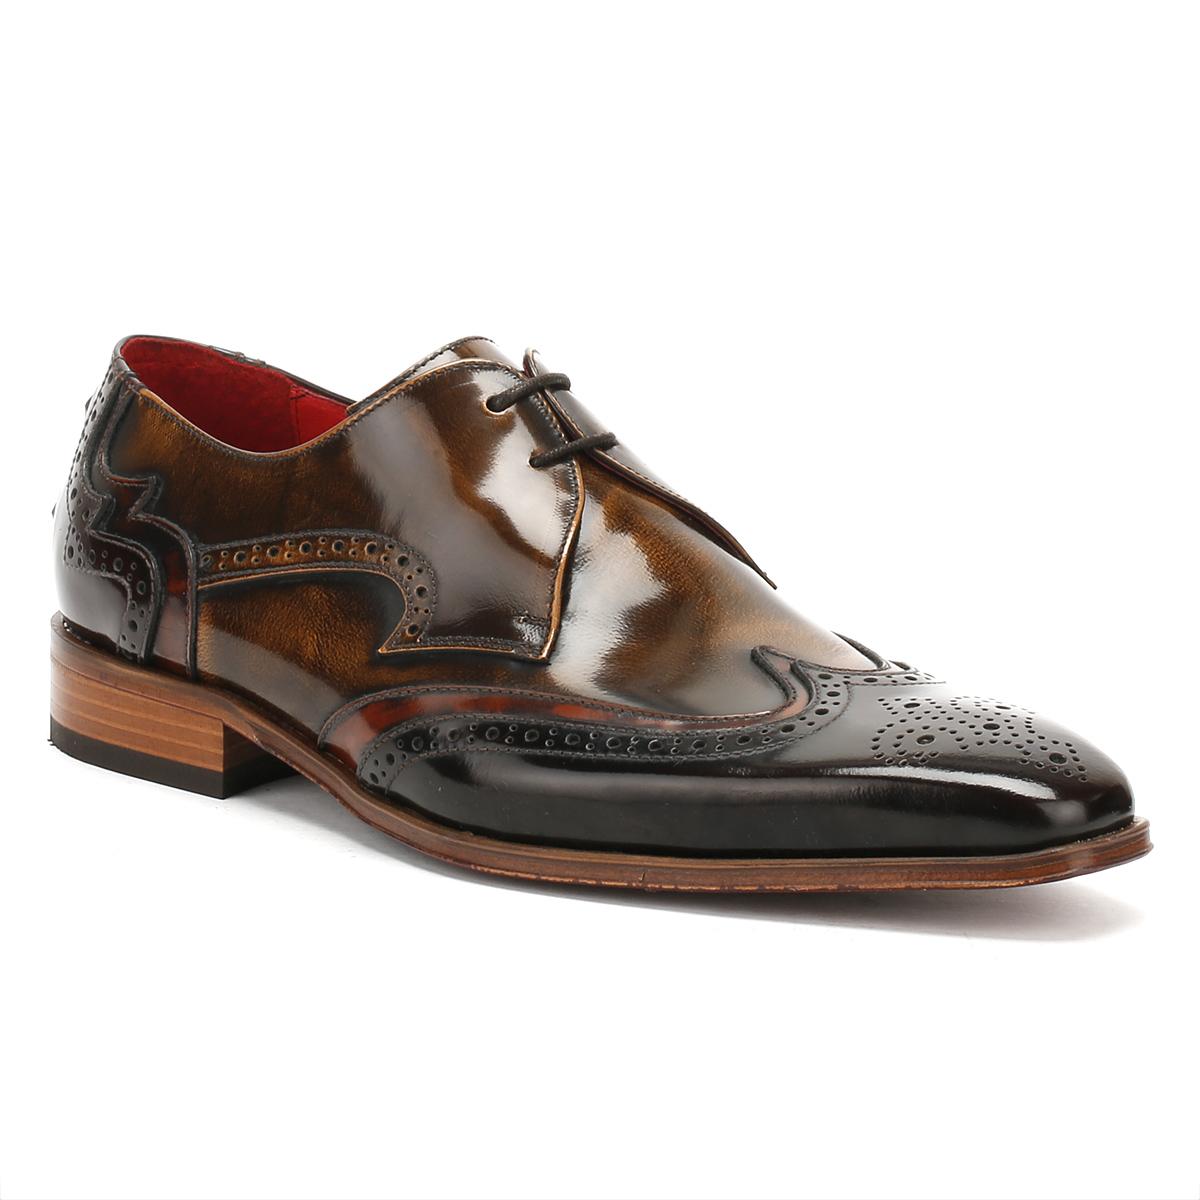 Jeffery West Mens Dark & Mid Brown Derby Upper Shoes, Brogue Details, Leather Upper Derby 2c481e